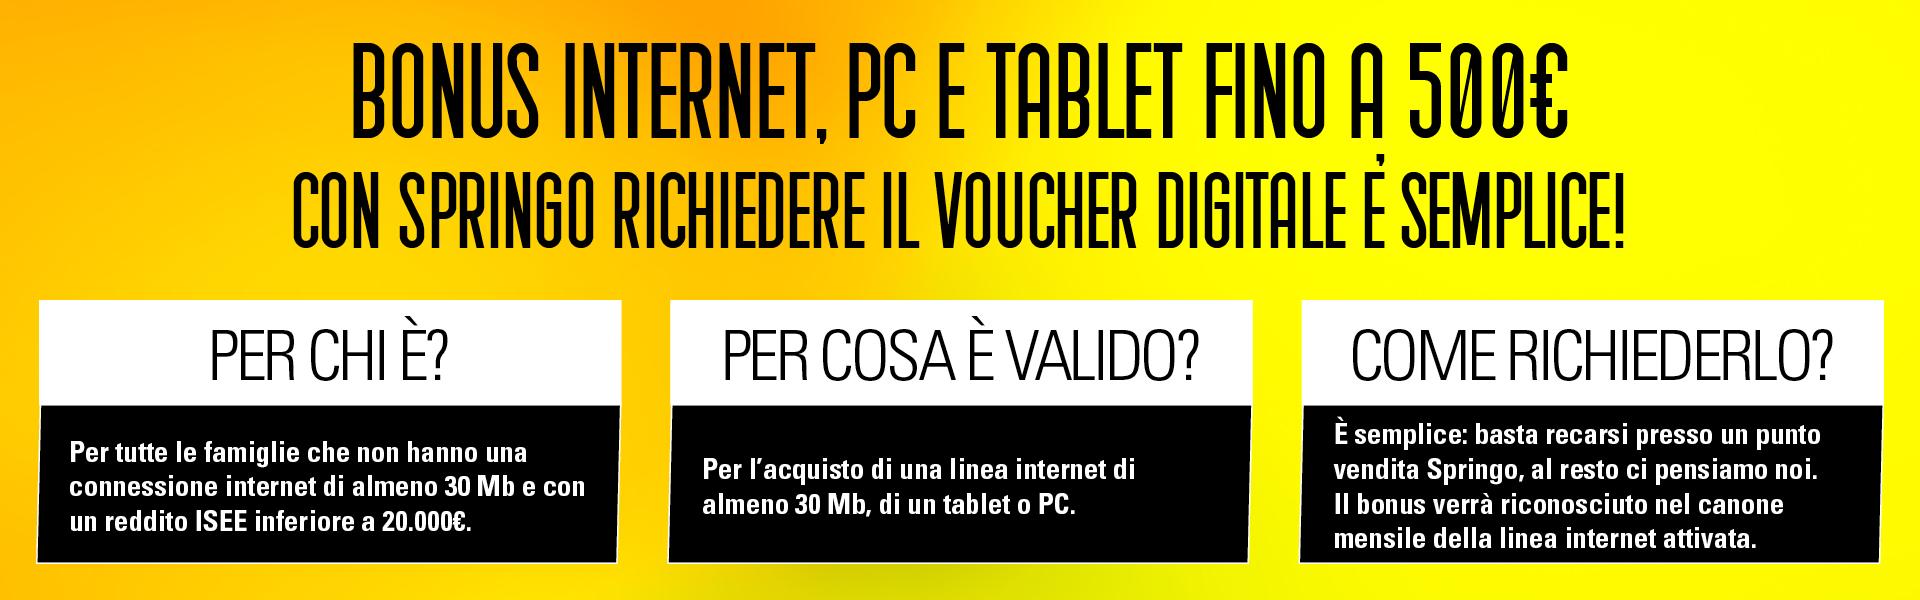 BONUS PC/TABLET